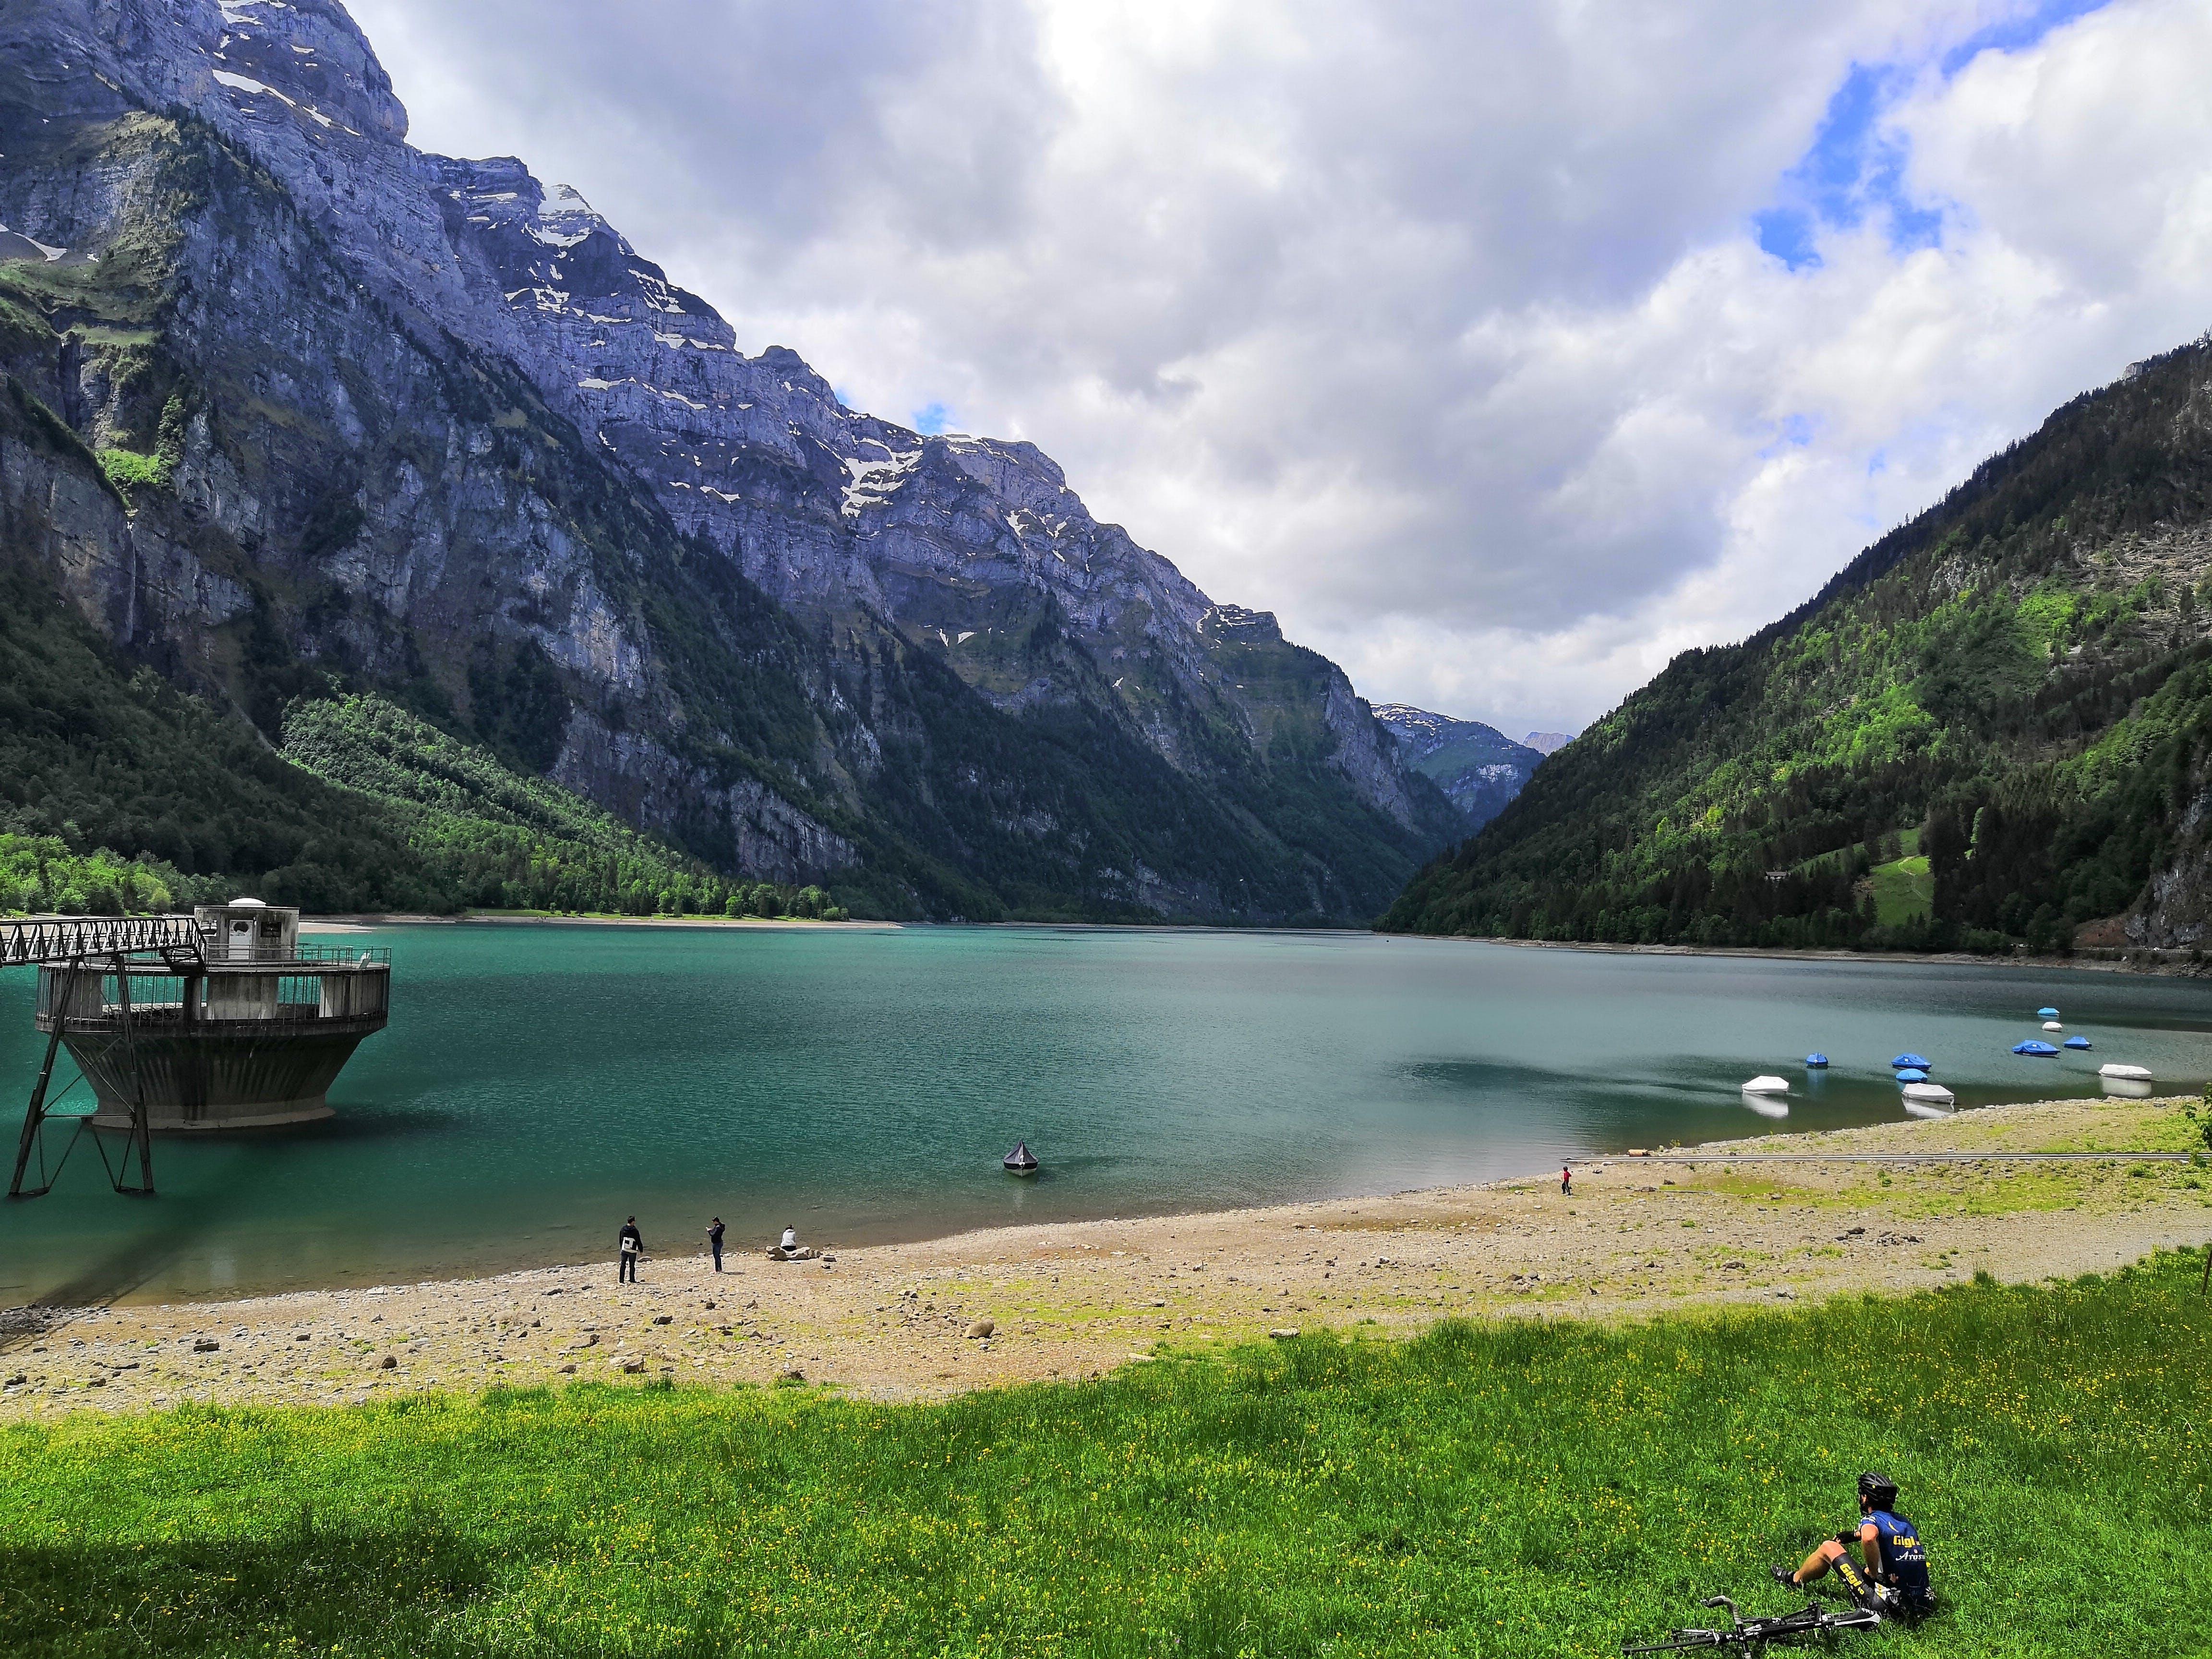 Klöntarelsee, Central Switzerland